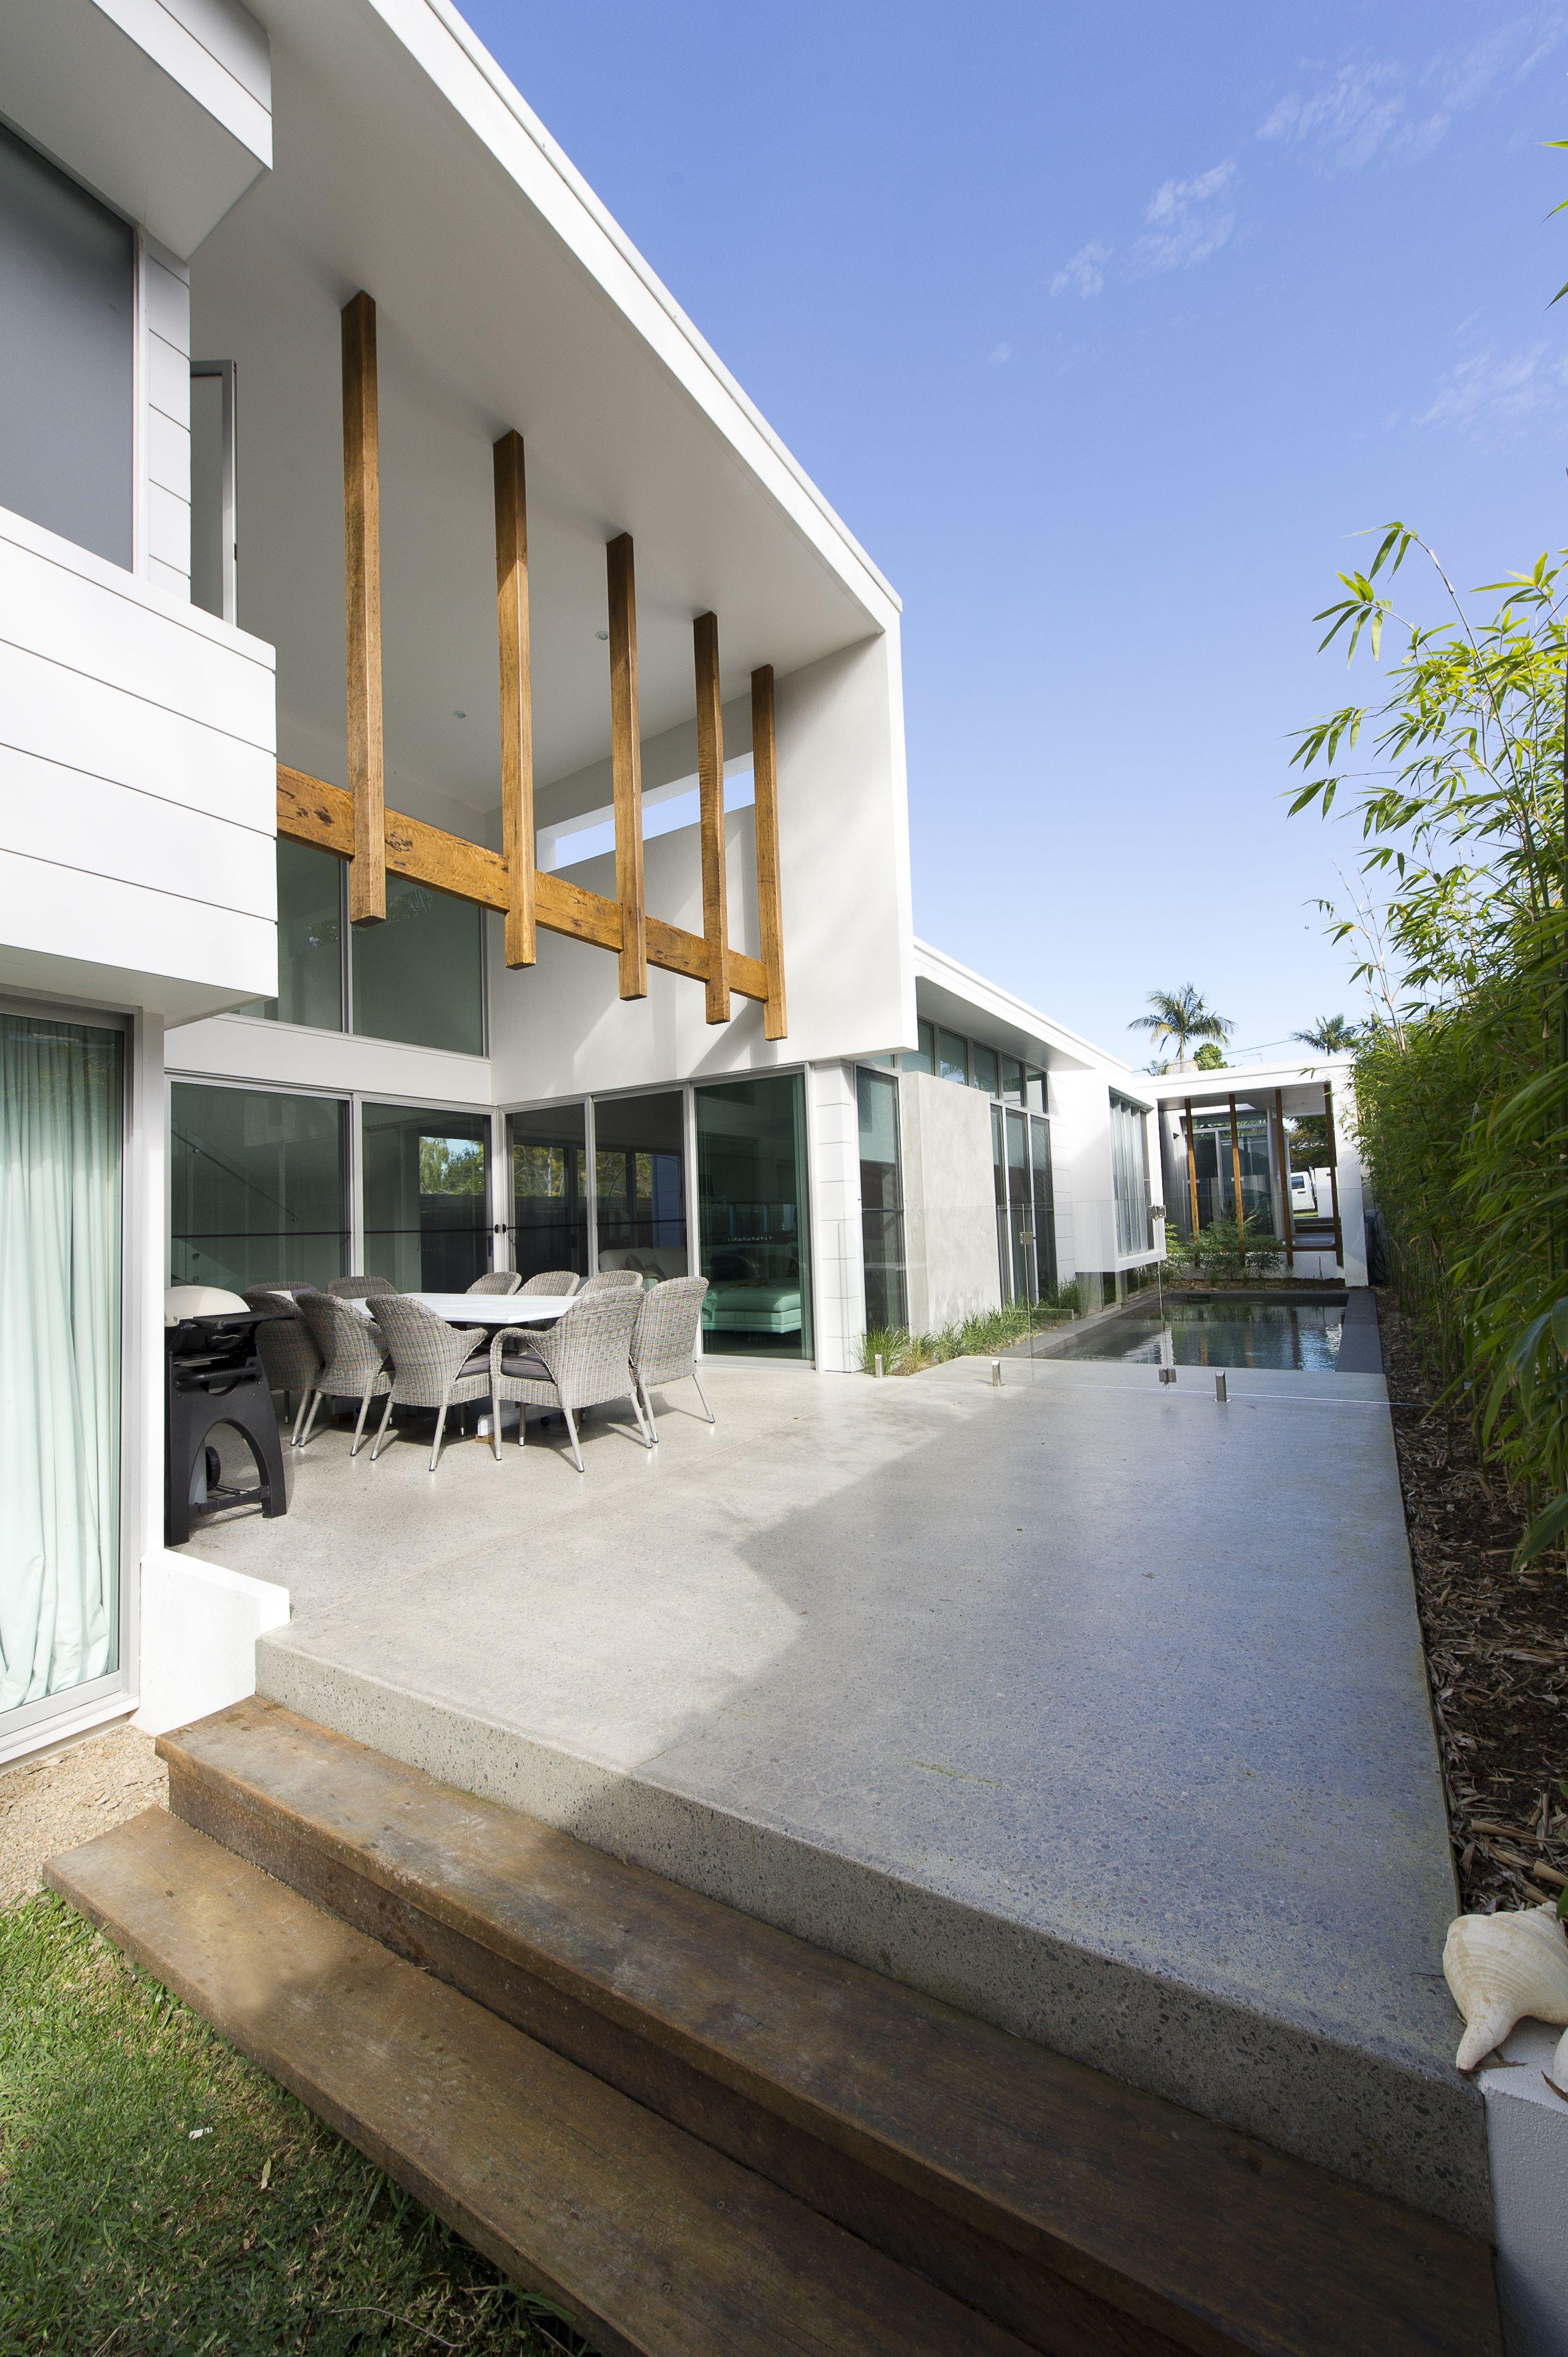 15+ Best Landscape Architecture Ideas | Creative Design